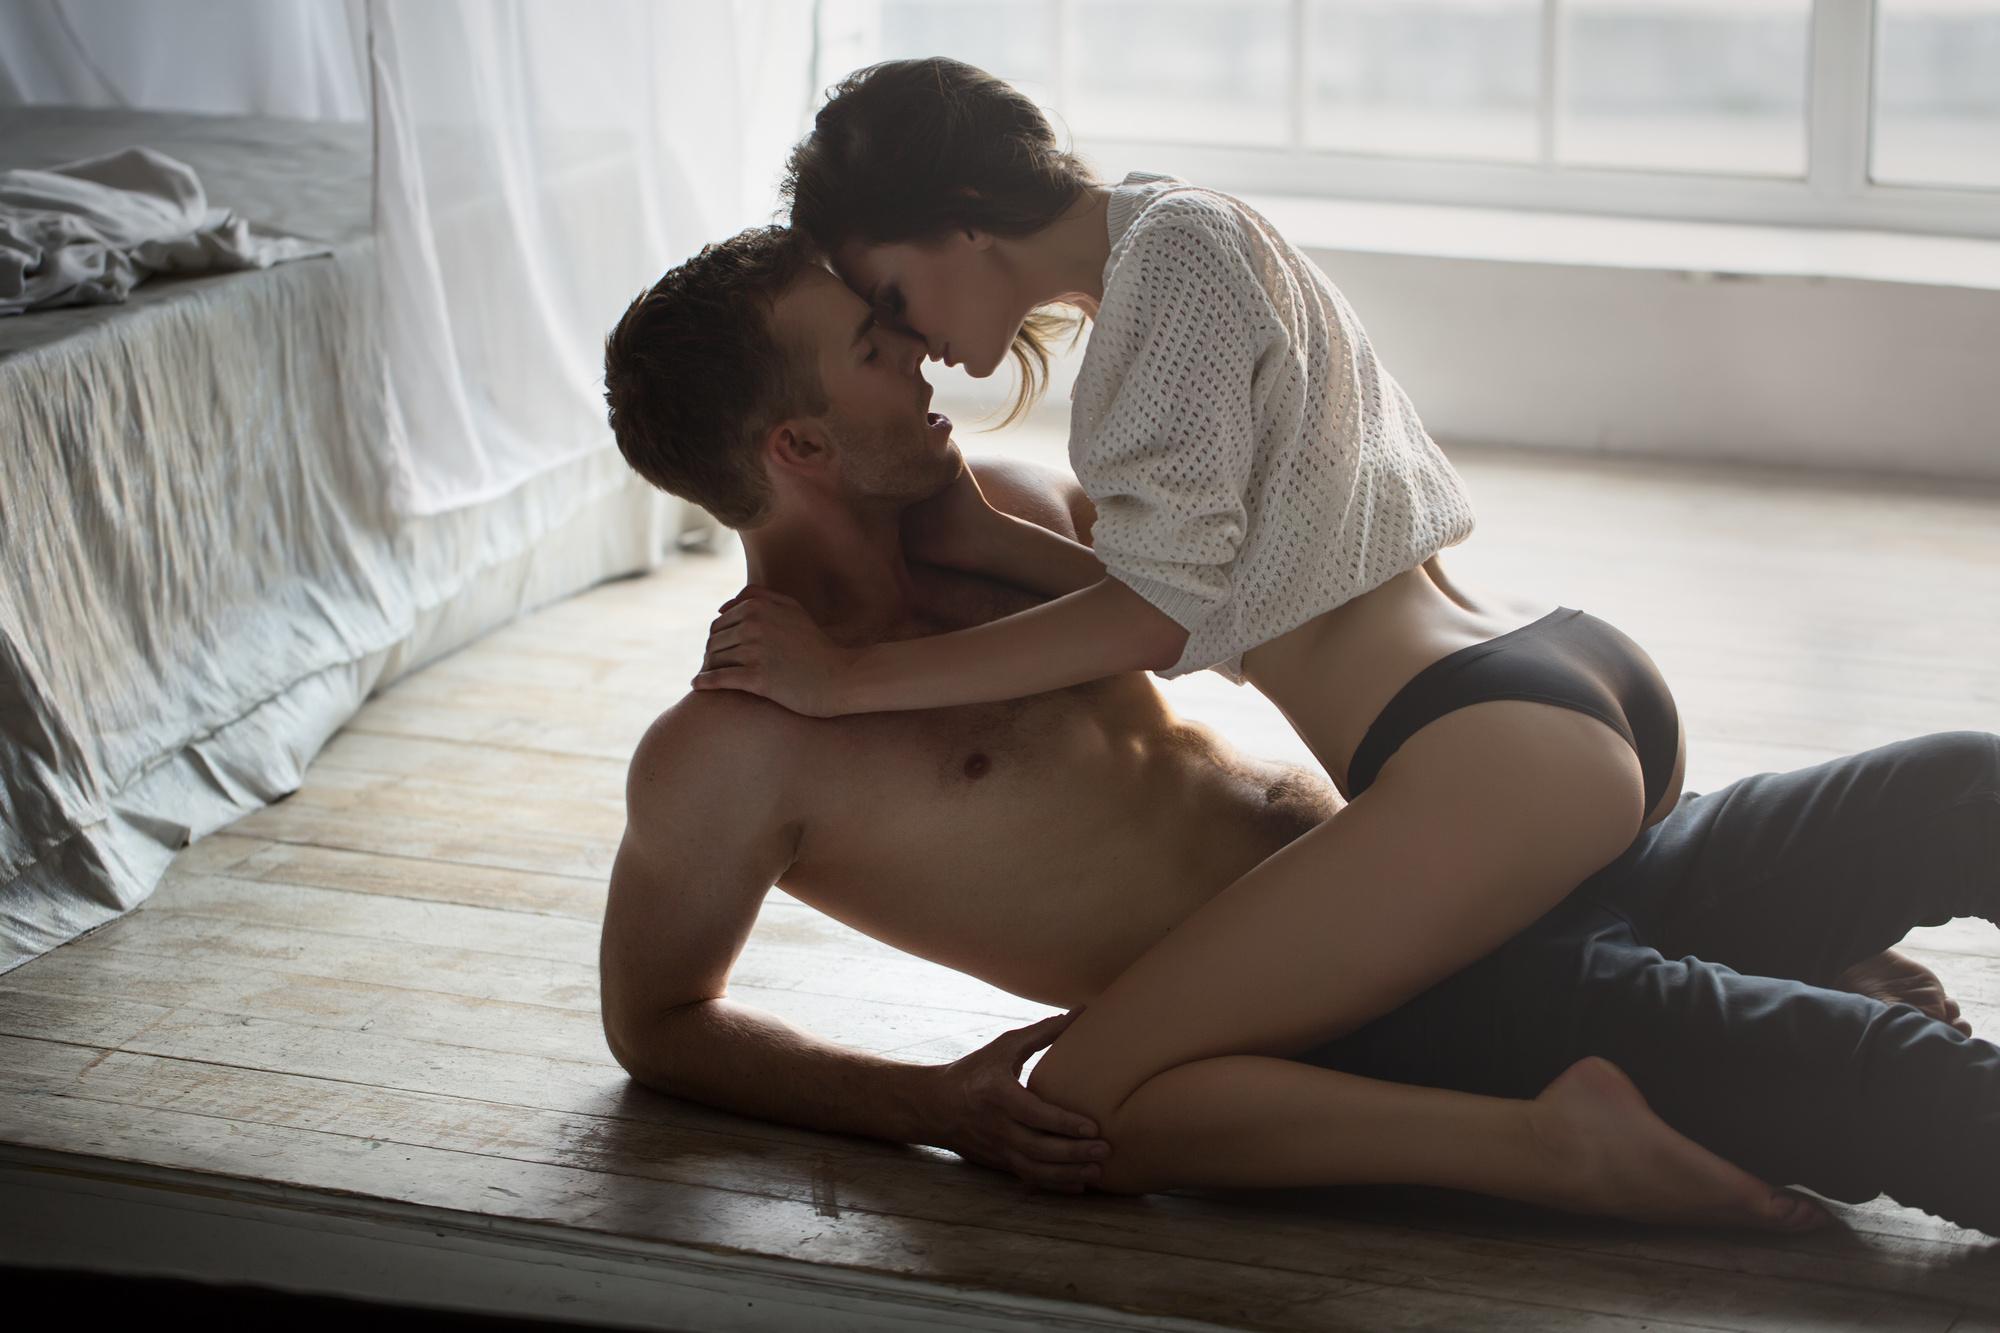 Sex tricks fun Oral Sex